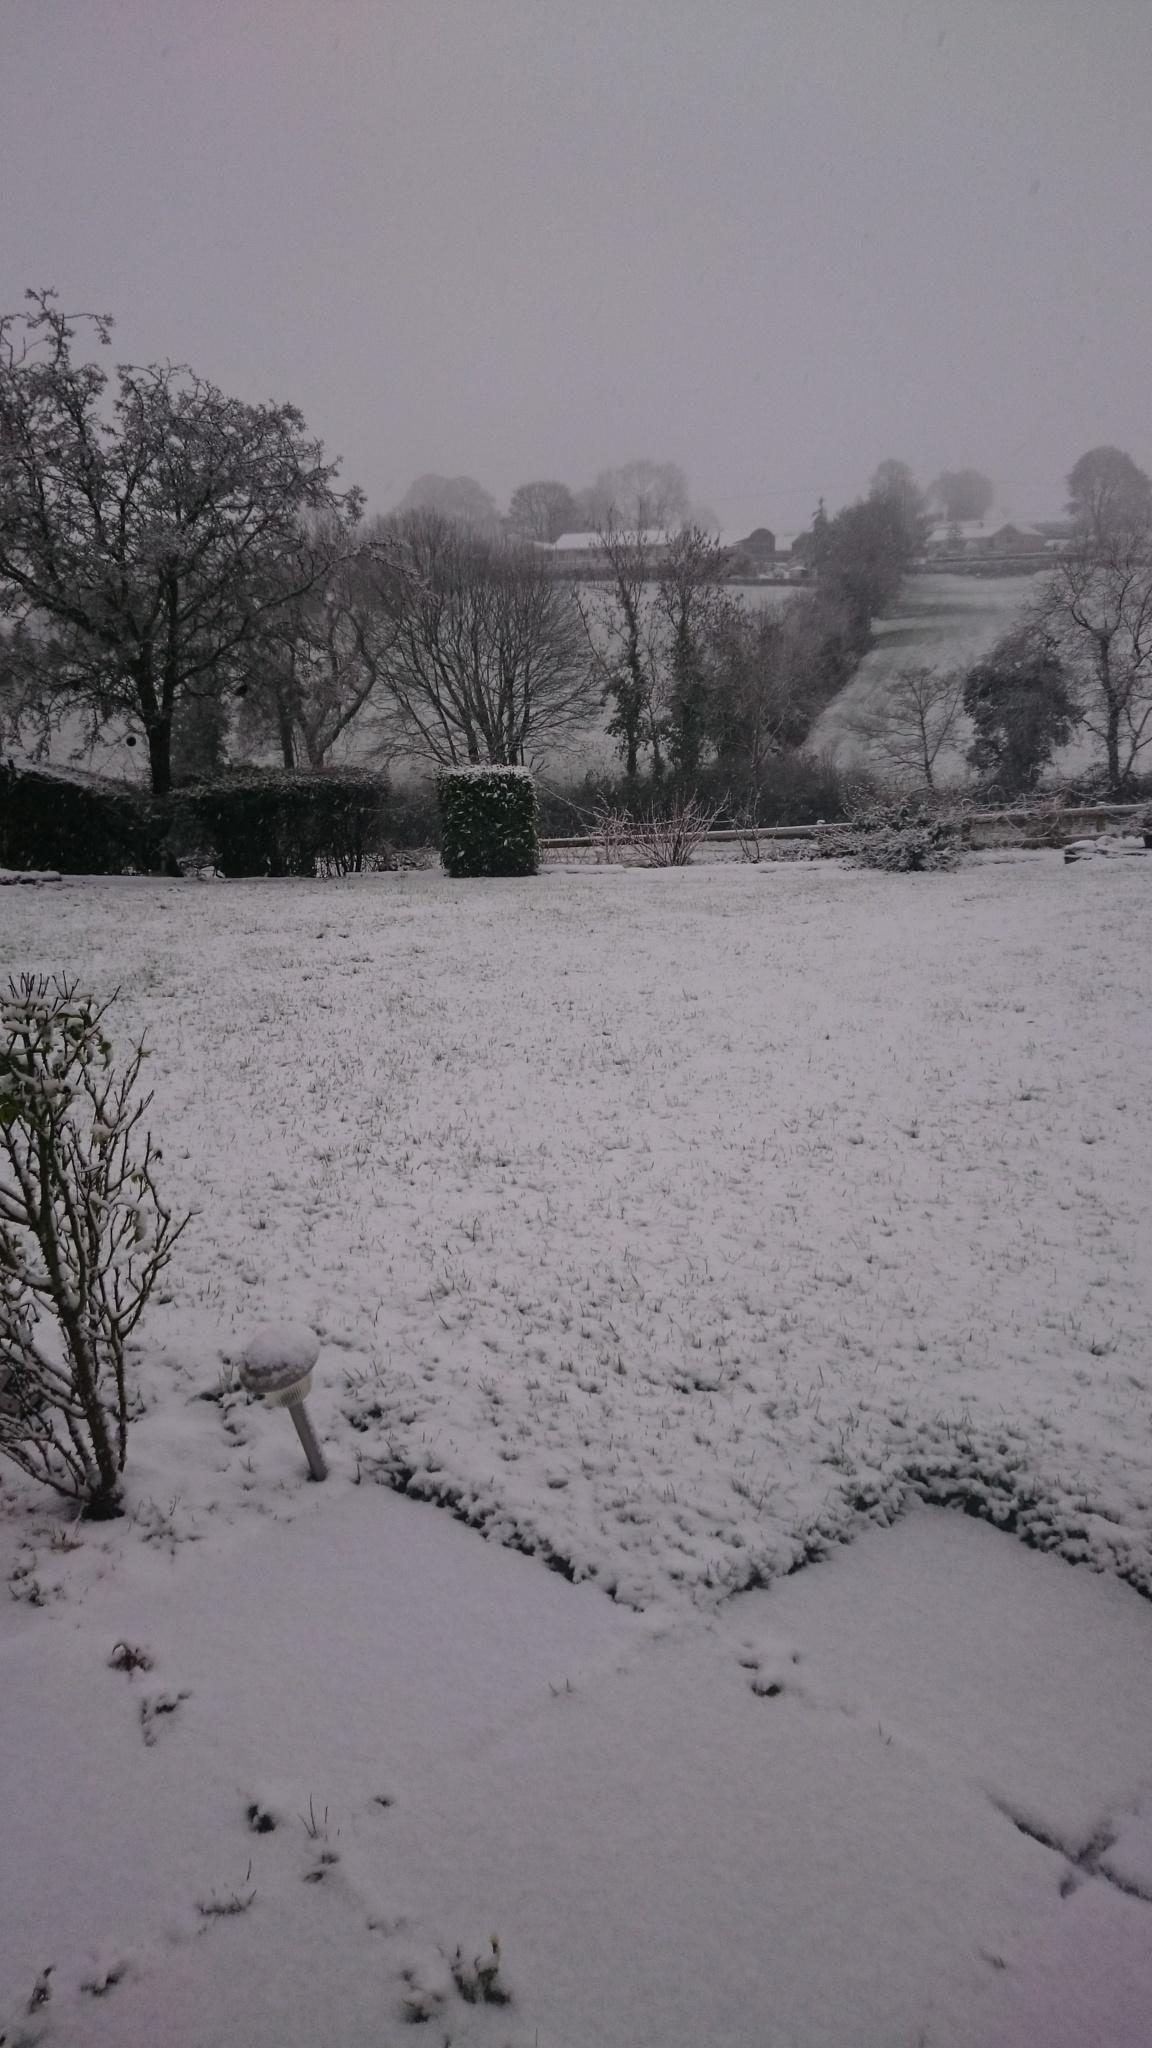 snowing  by adzamrx3